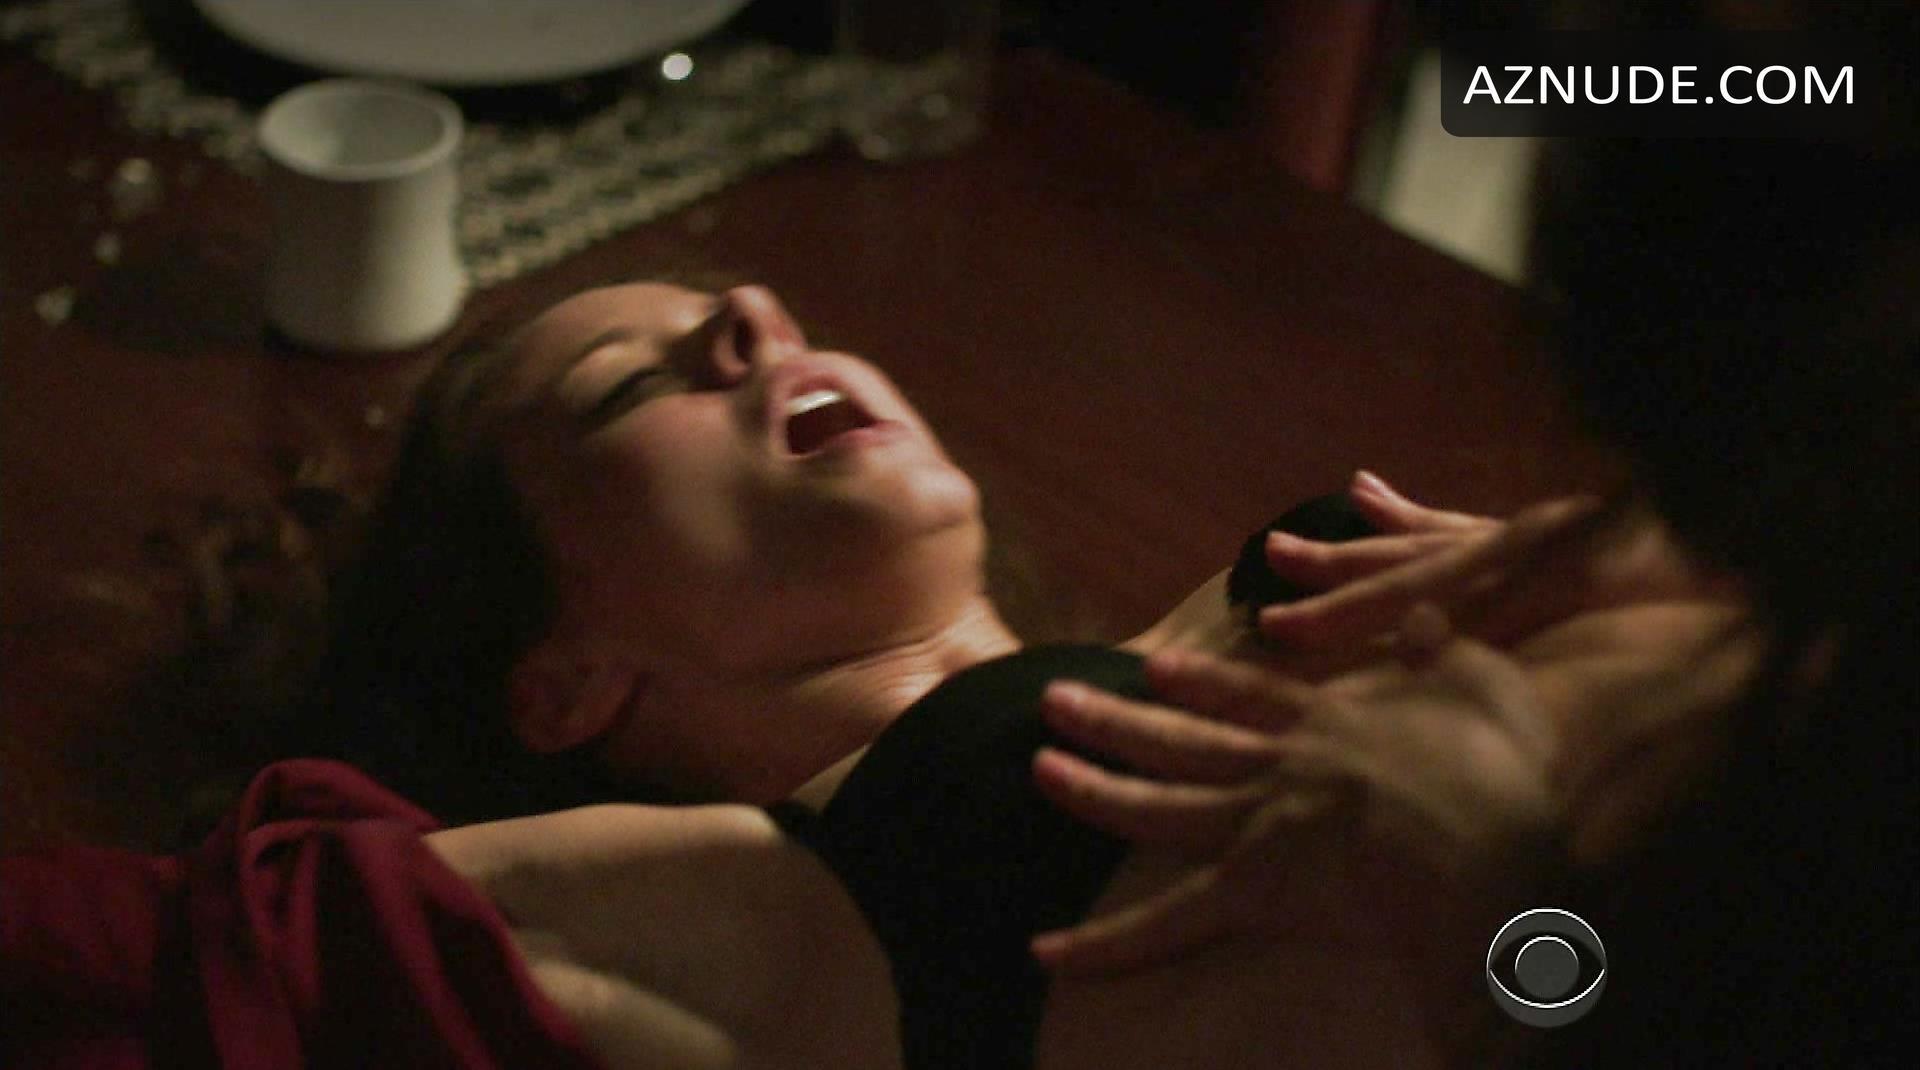 Amy Acker Nackt amy acker nude - aznude